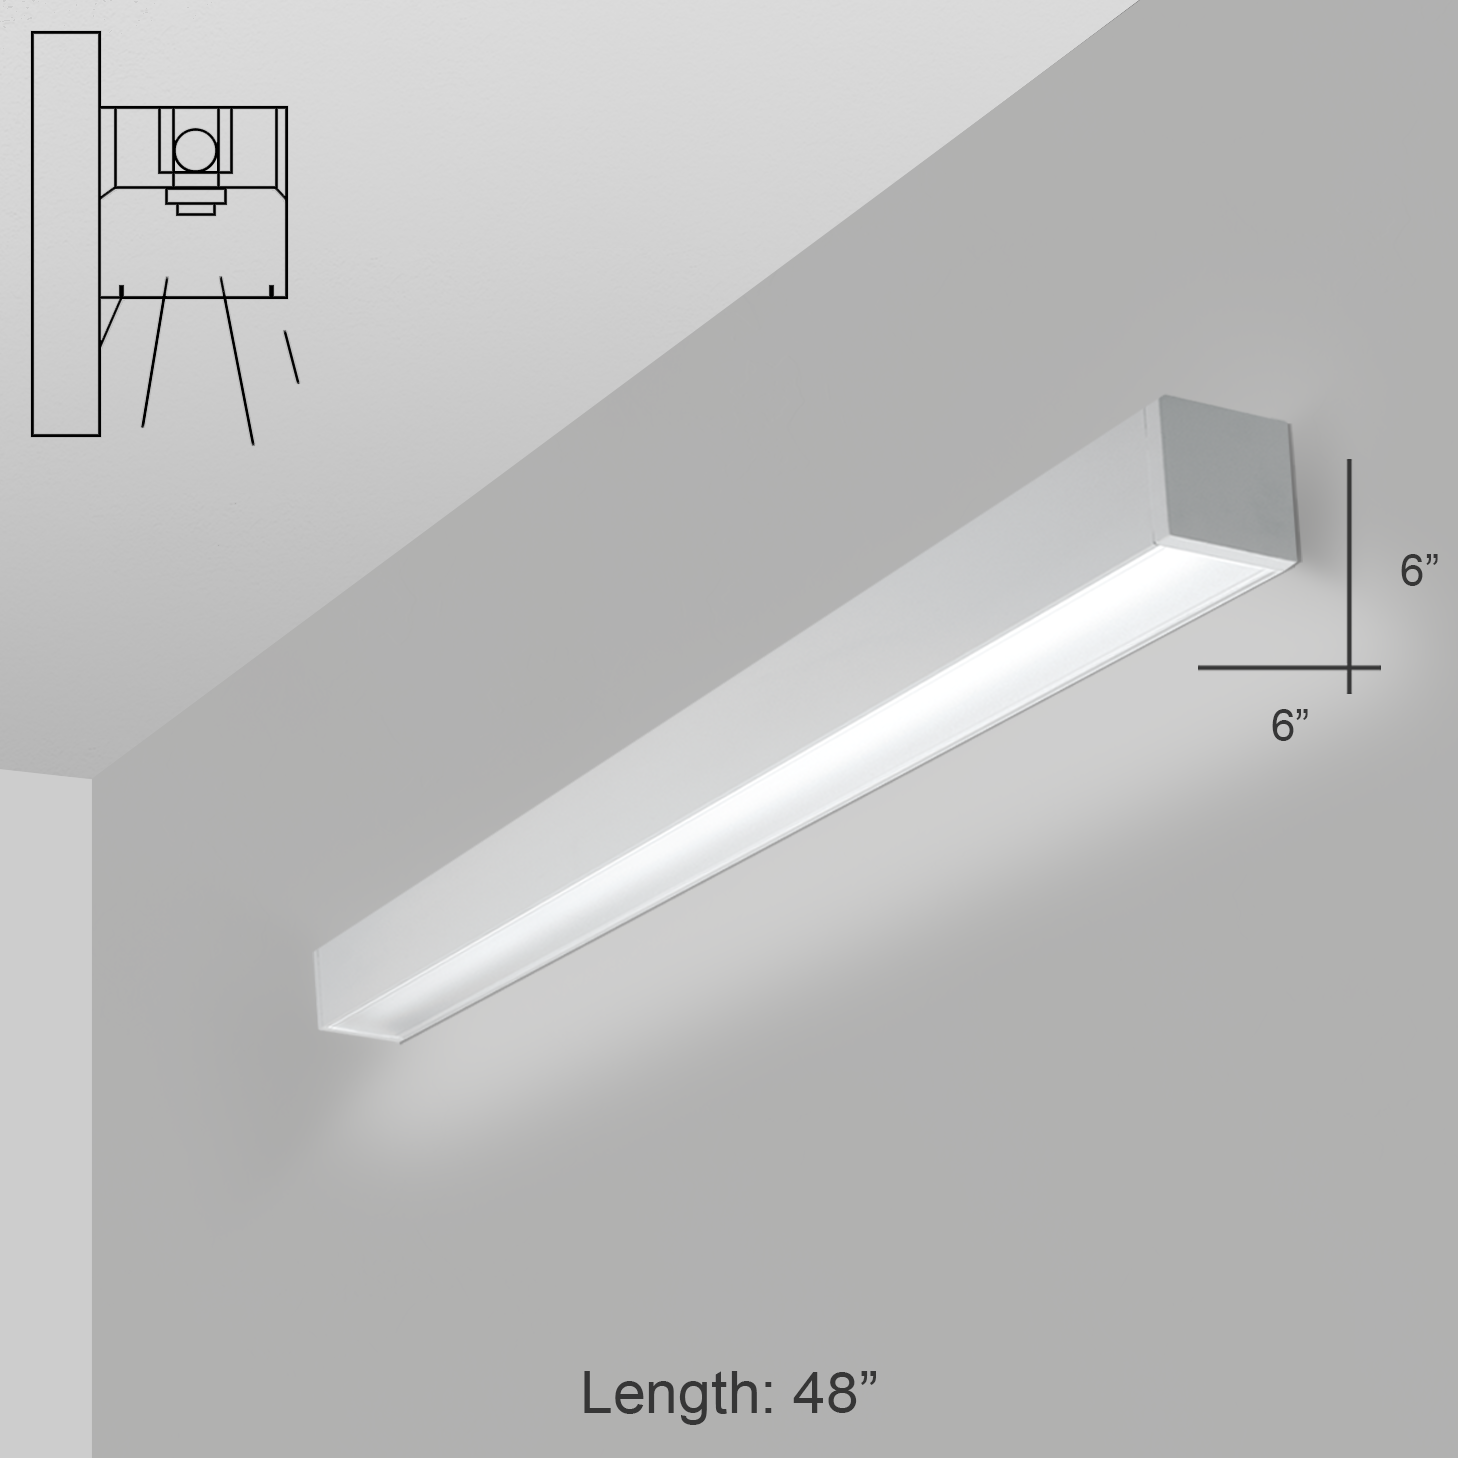 Alcon Lighting 12200 6 W 4 Rft Series